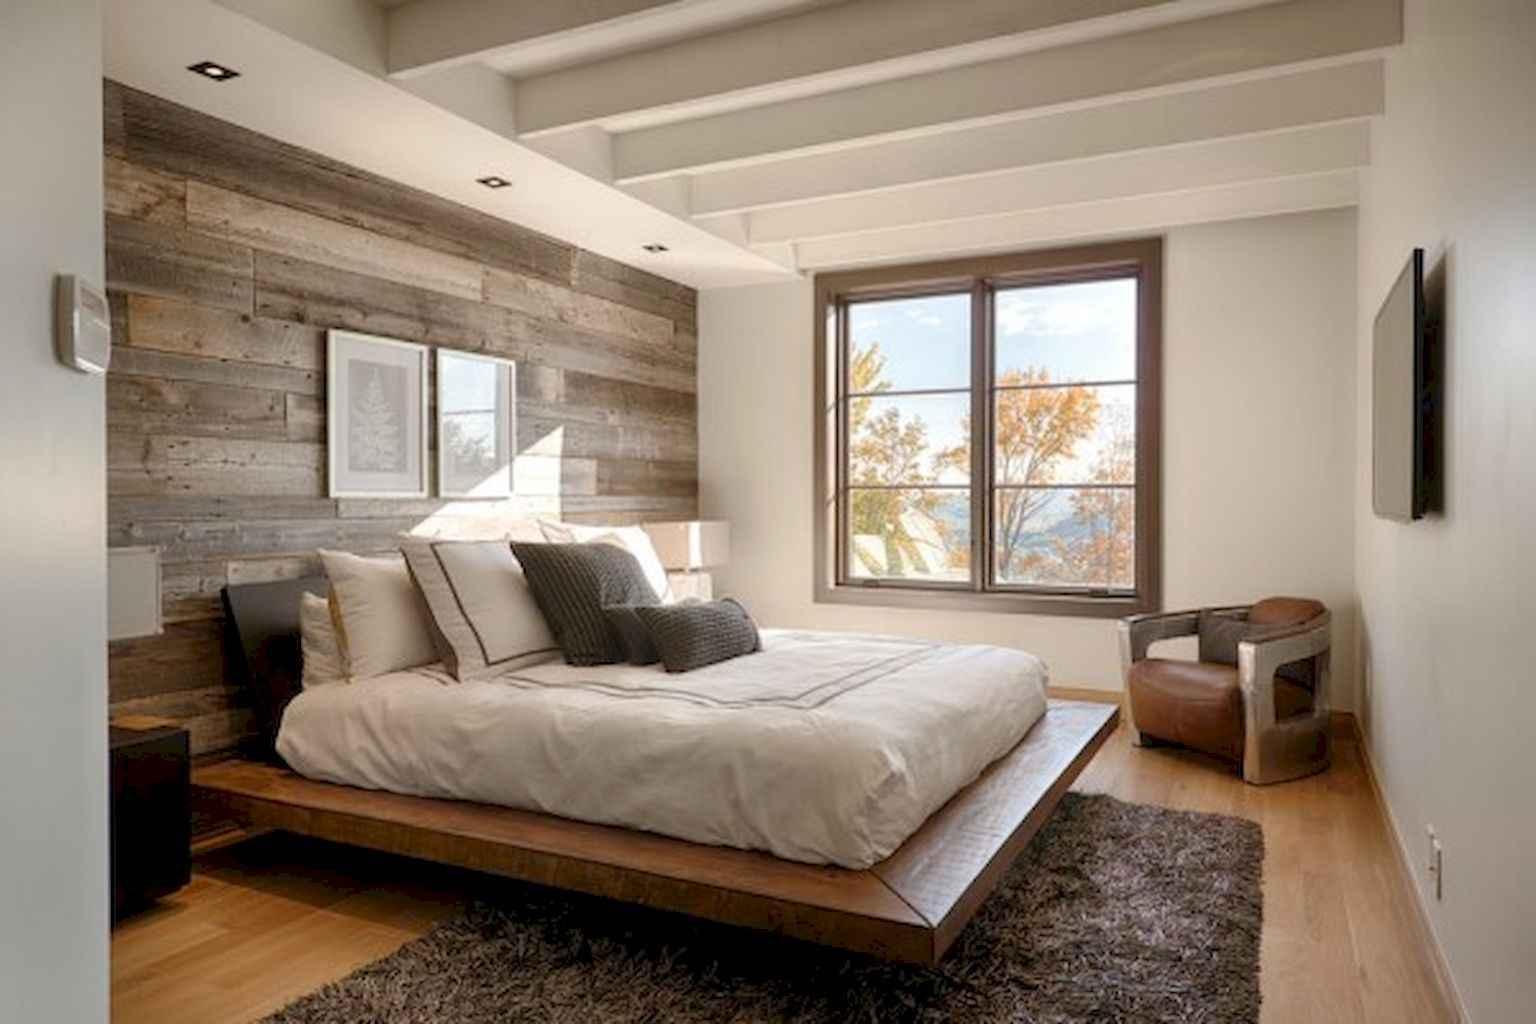 100 Stunning Farmhouse Master Bedroom Decor Ideas (65)